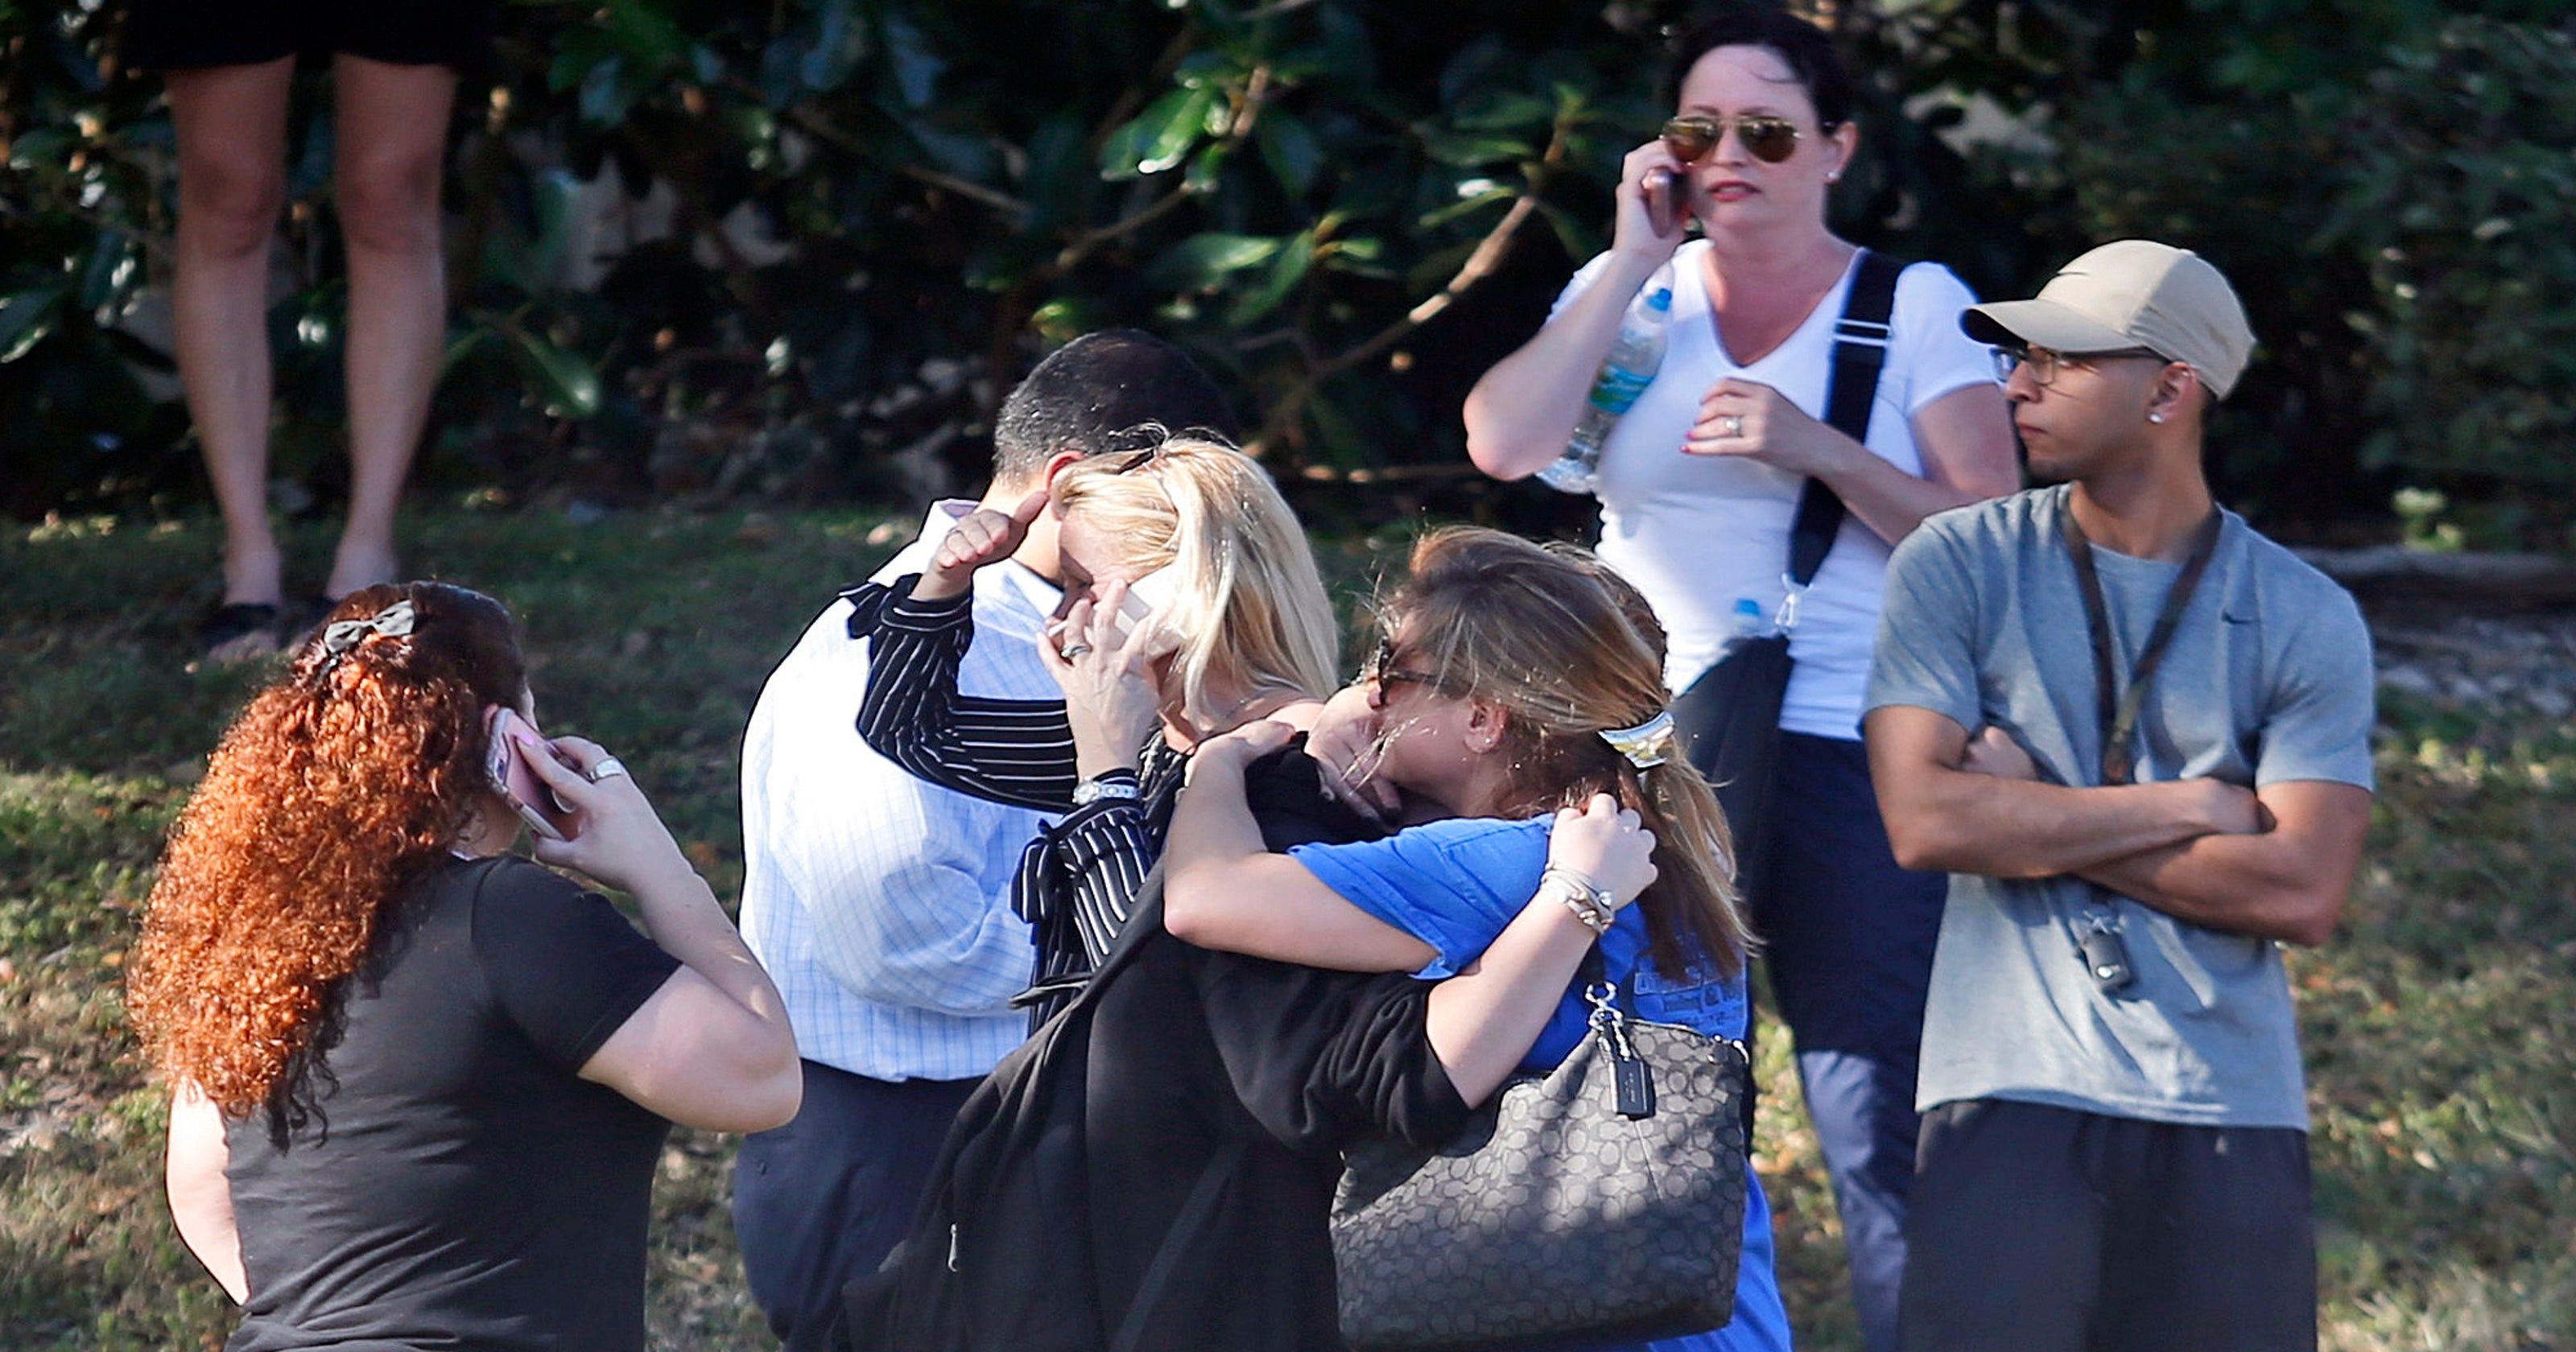 Florida school shooting: 17 dead in Parkland High School